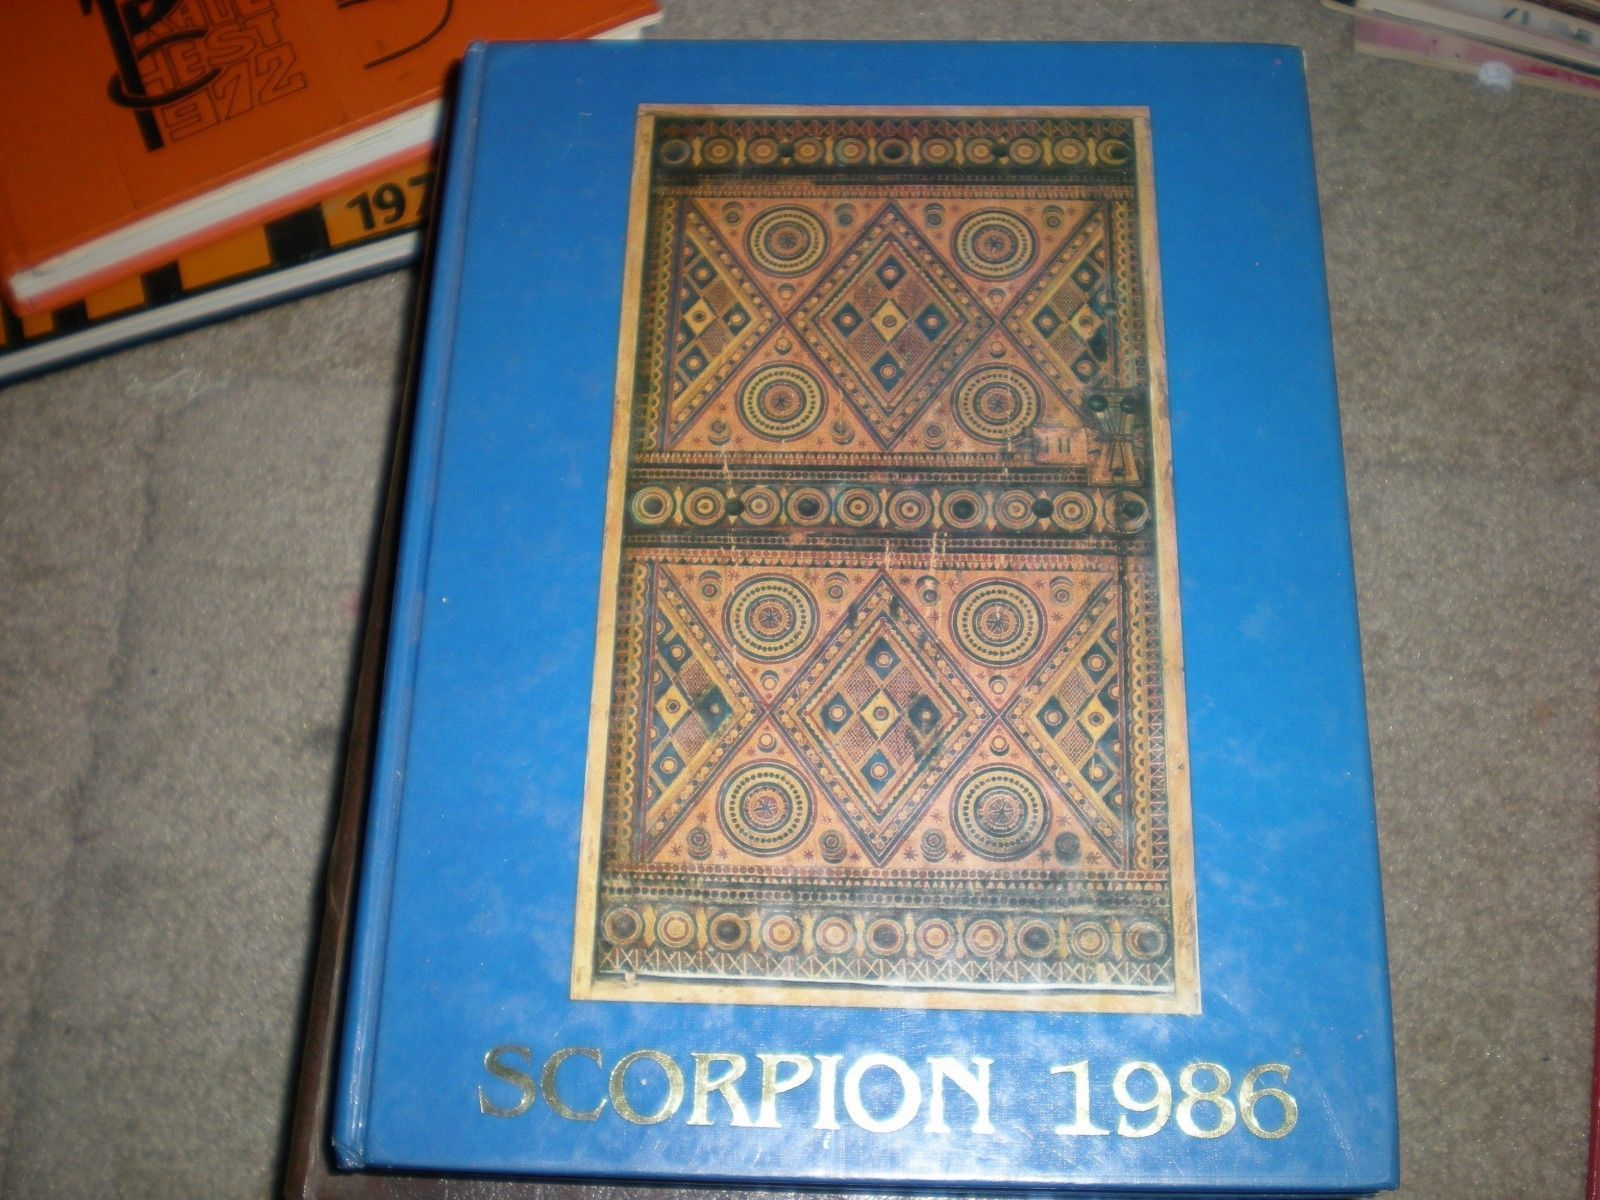 1986 Dhahran Academy High School Yearbook Annual Genealogy Saudi Arabia Ebay High School Yearbook Yearbook High School